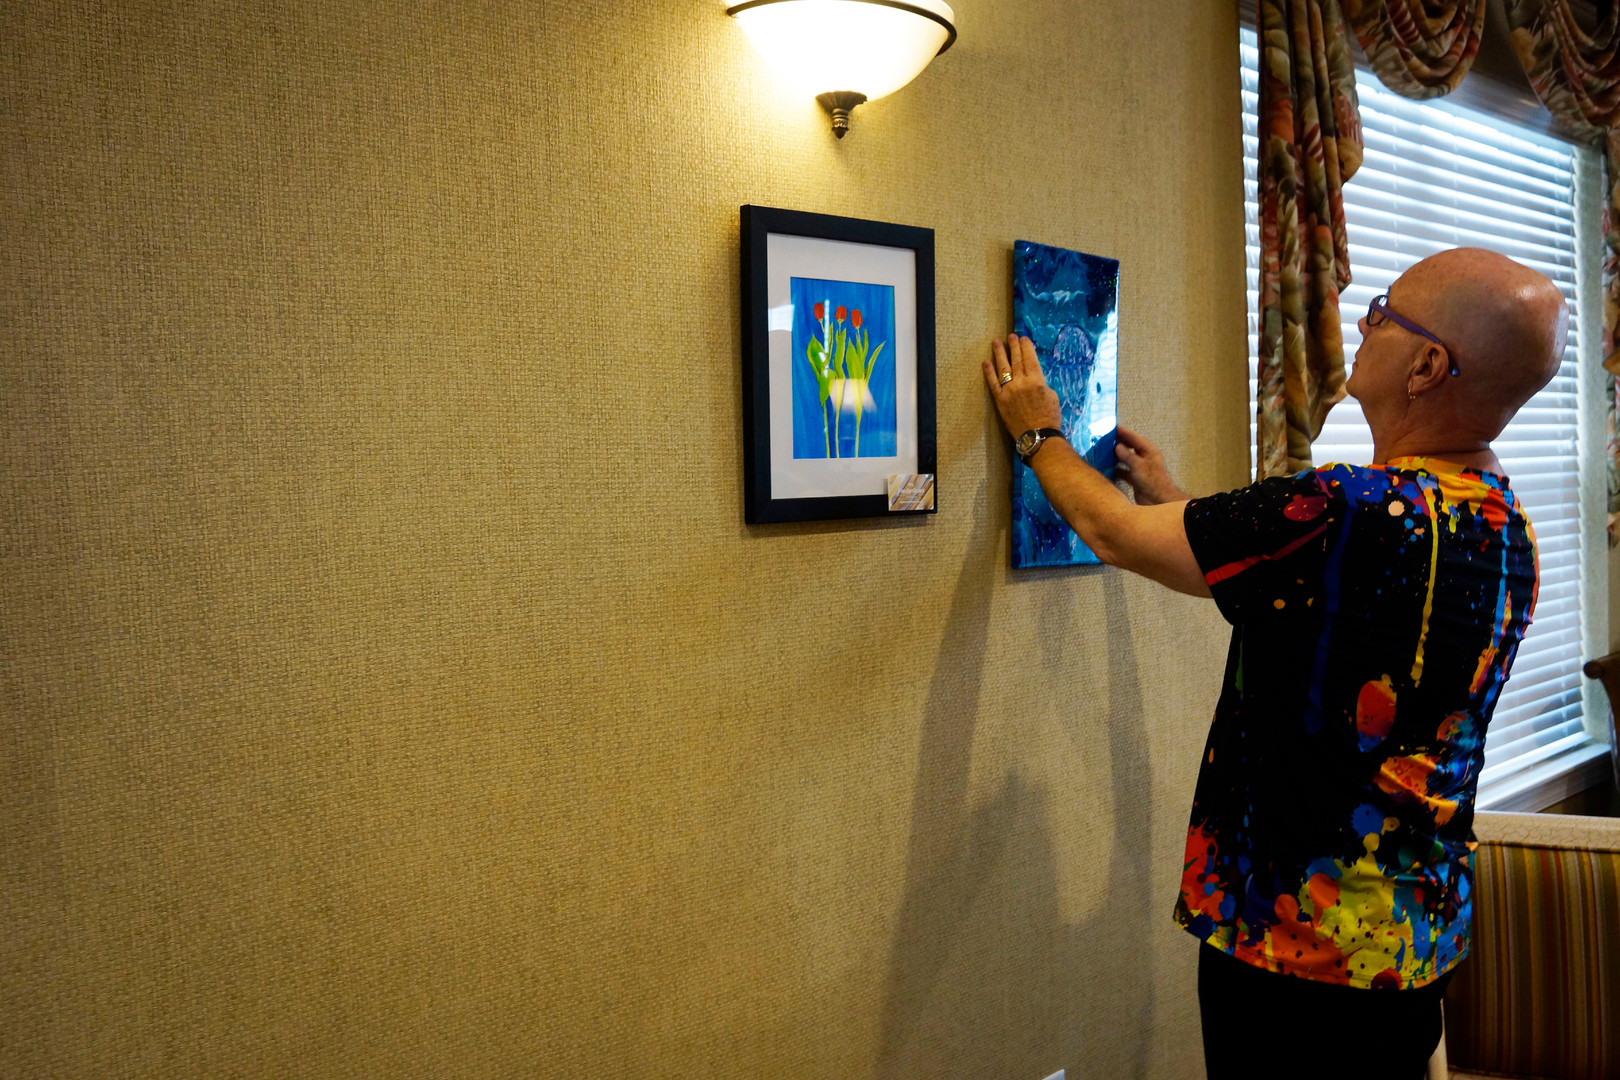 Phred Madsen-Vallee hanging artwork at Brennity Gallery